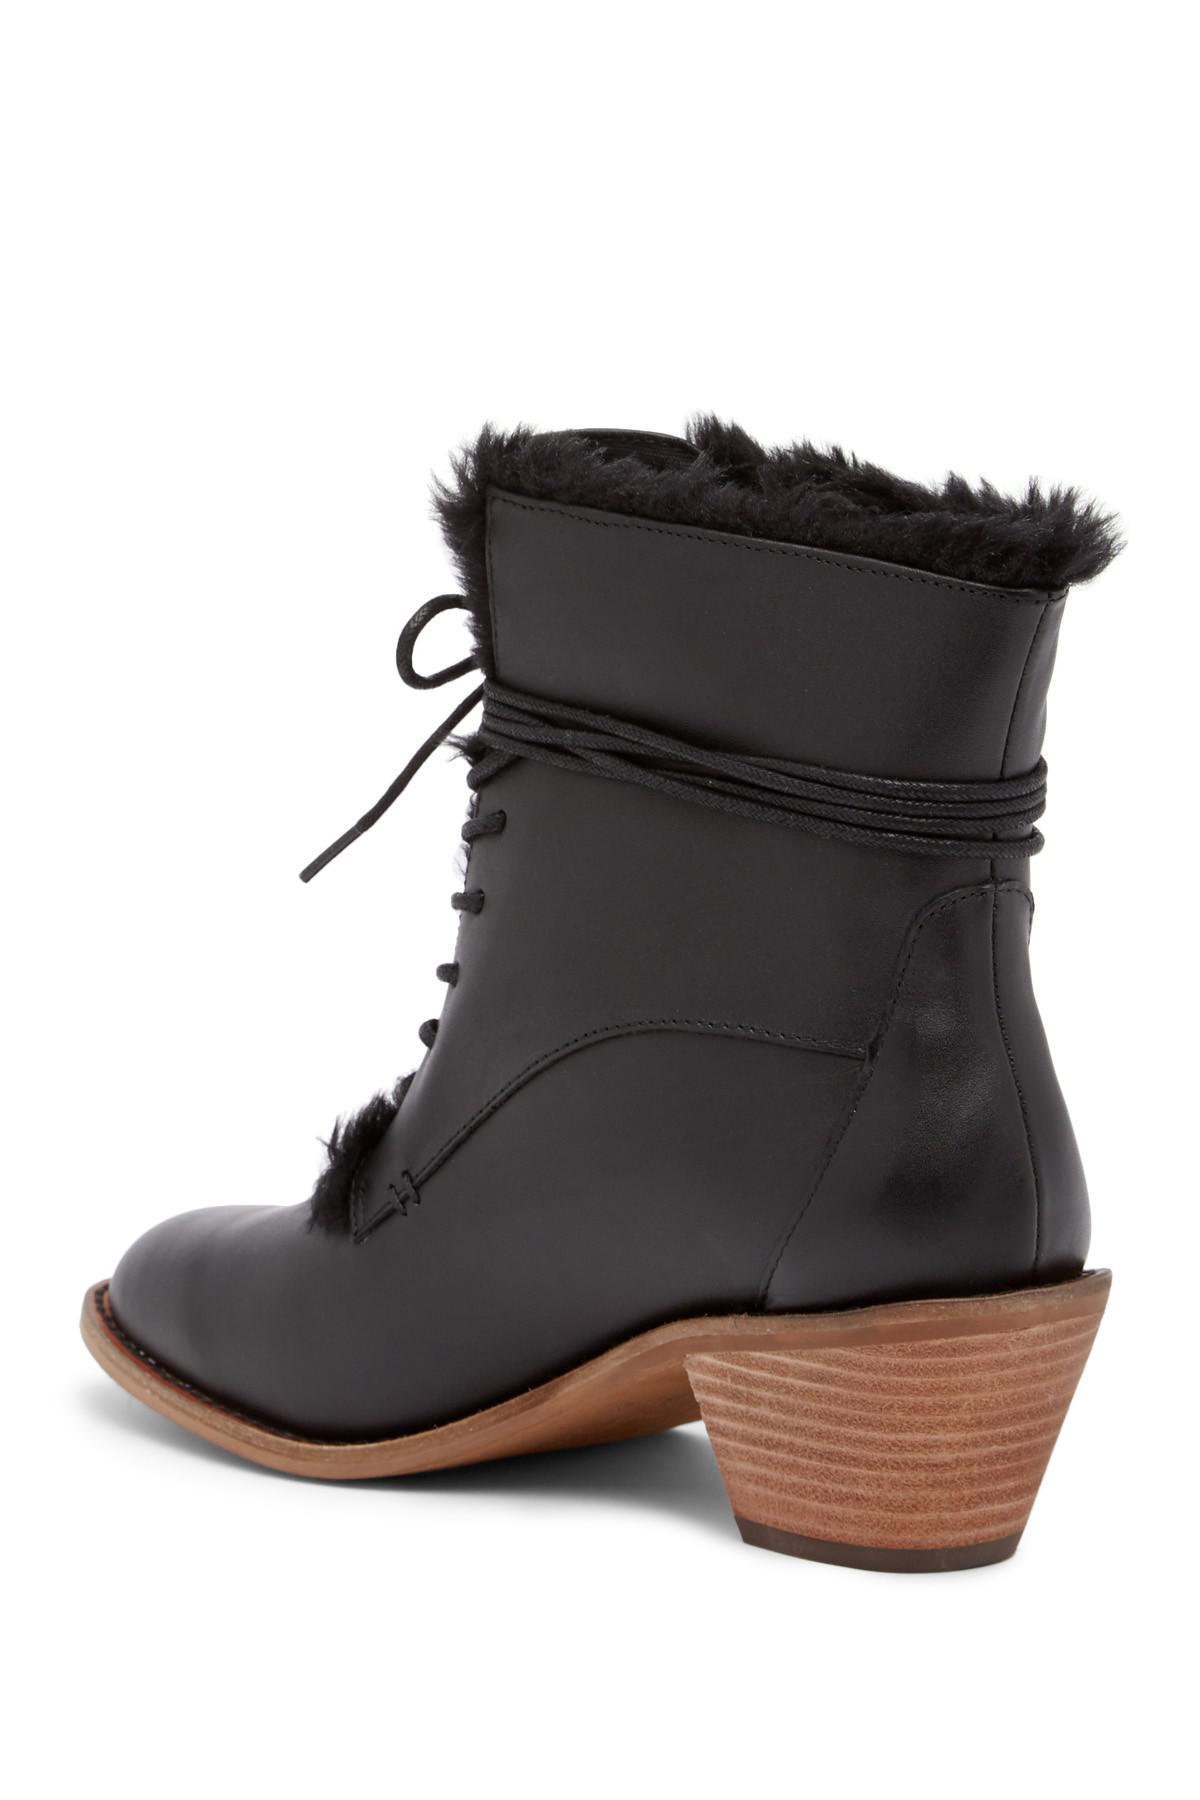 e9af14d54cf55 Lyst - Kelsi Dagger Brooklyn Kingsdale Faux Fur Lined Leather Boot ...